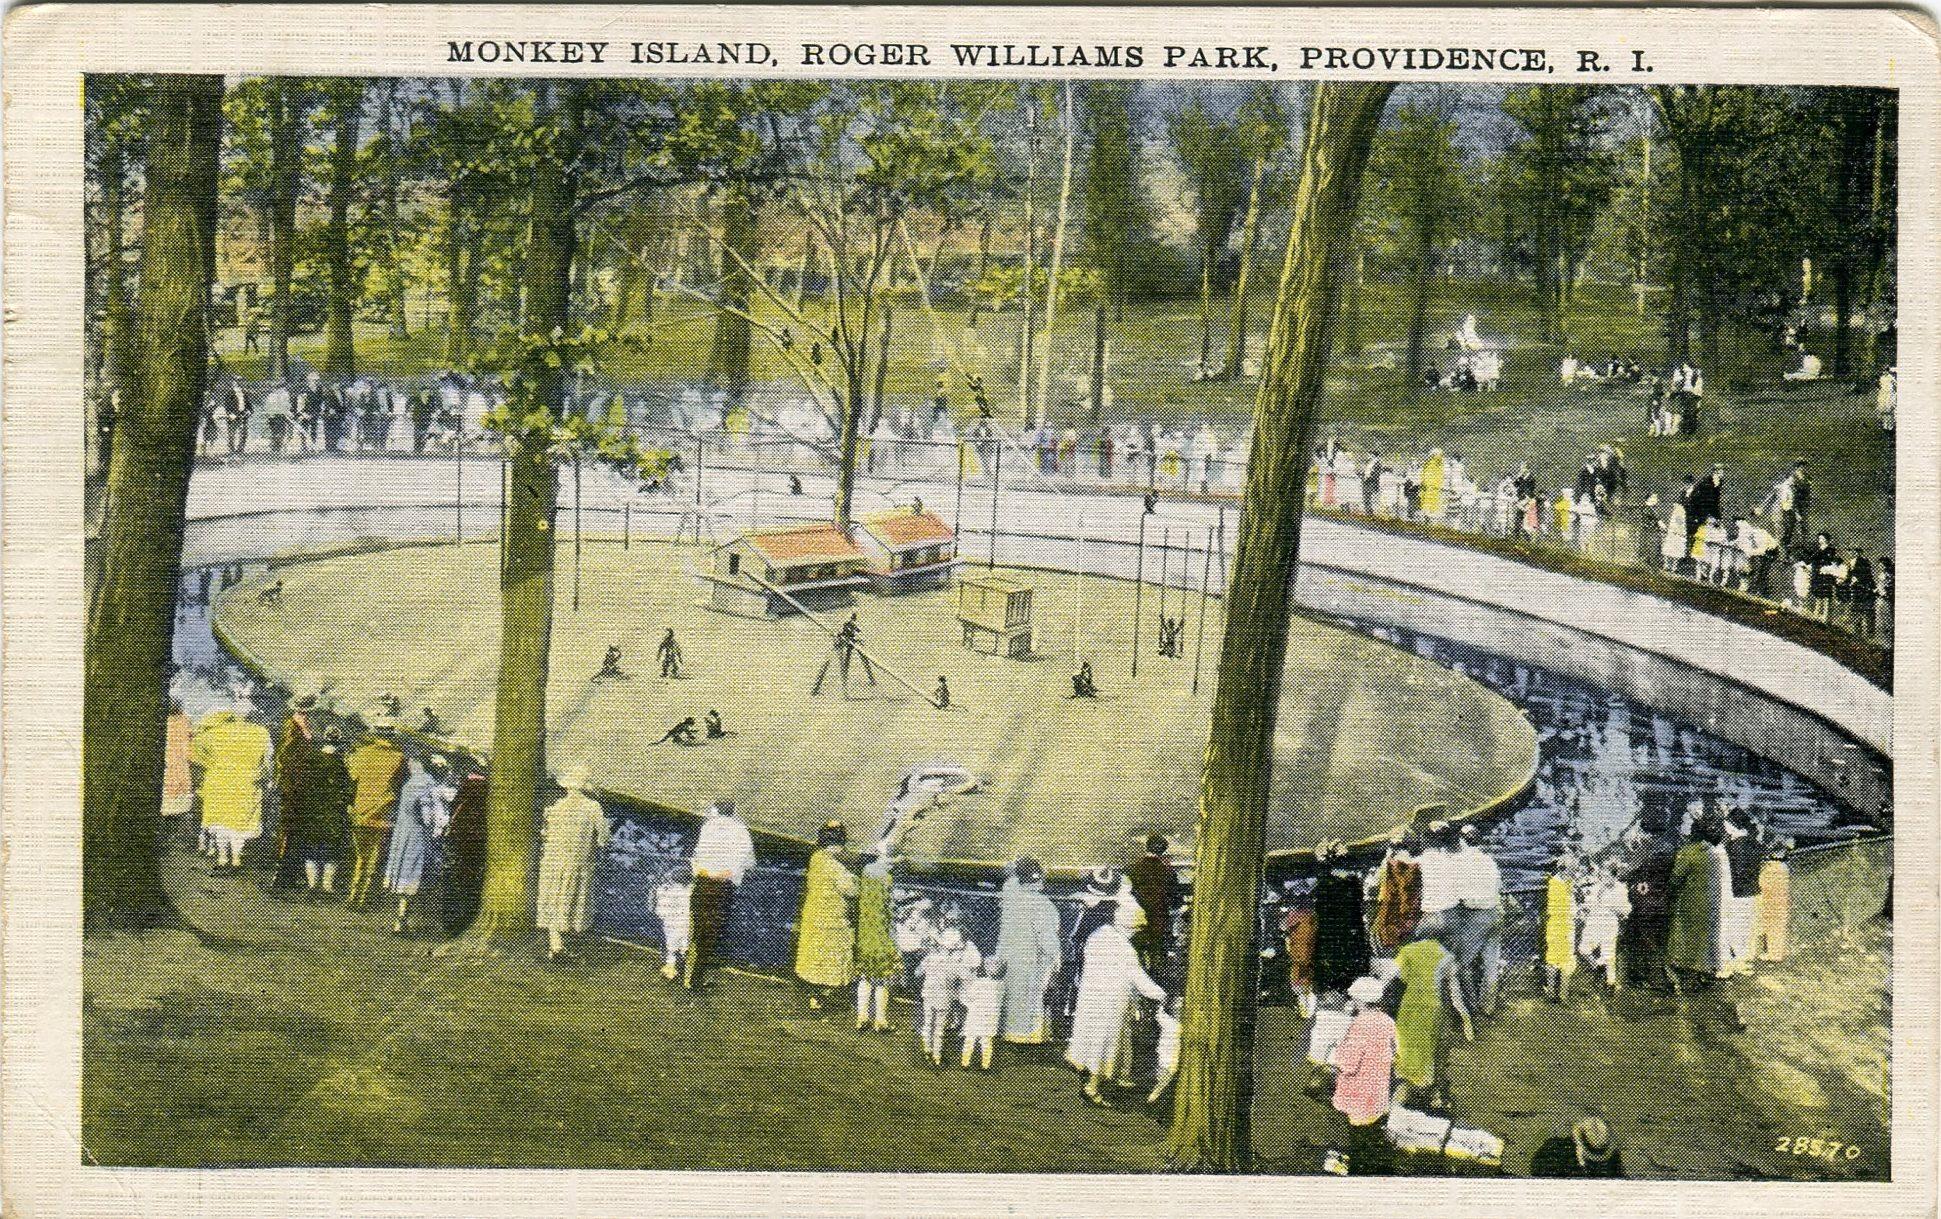 Monkey Island Postcard 1920s.jpg